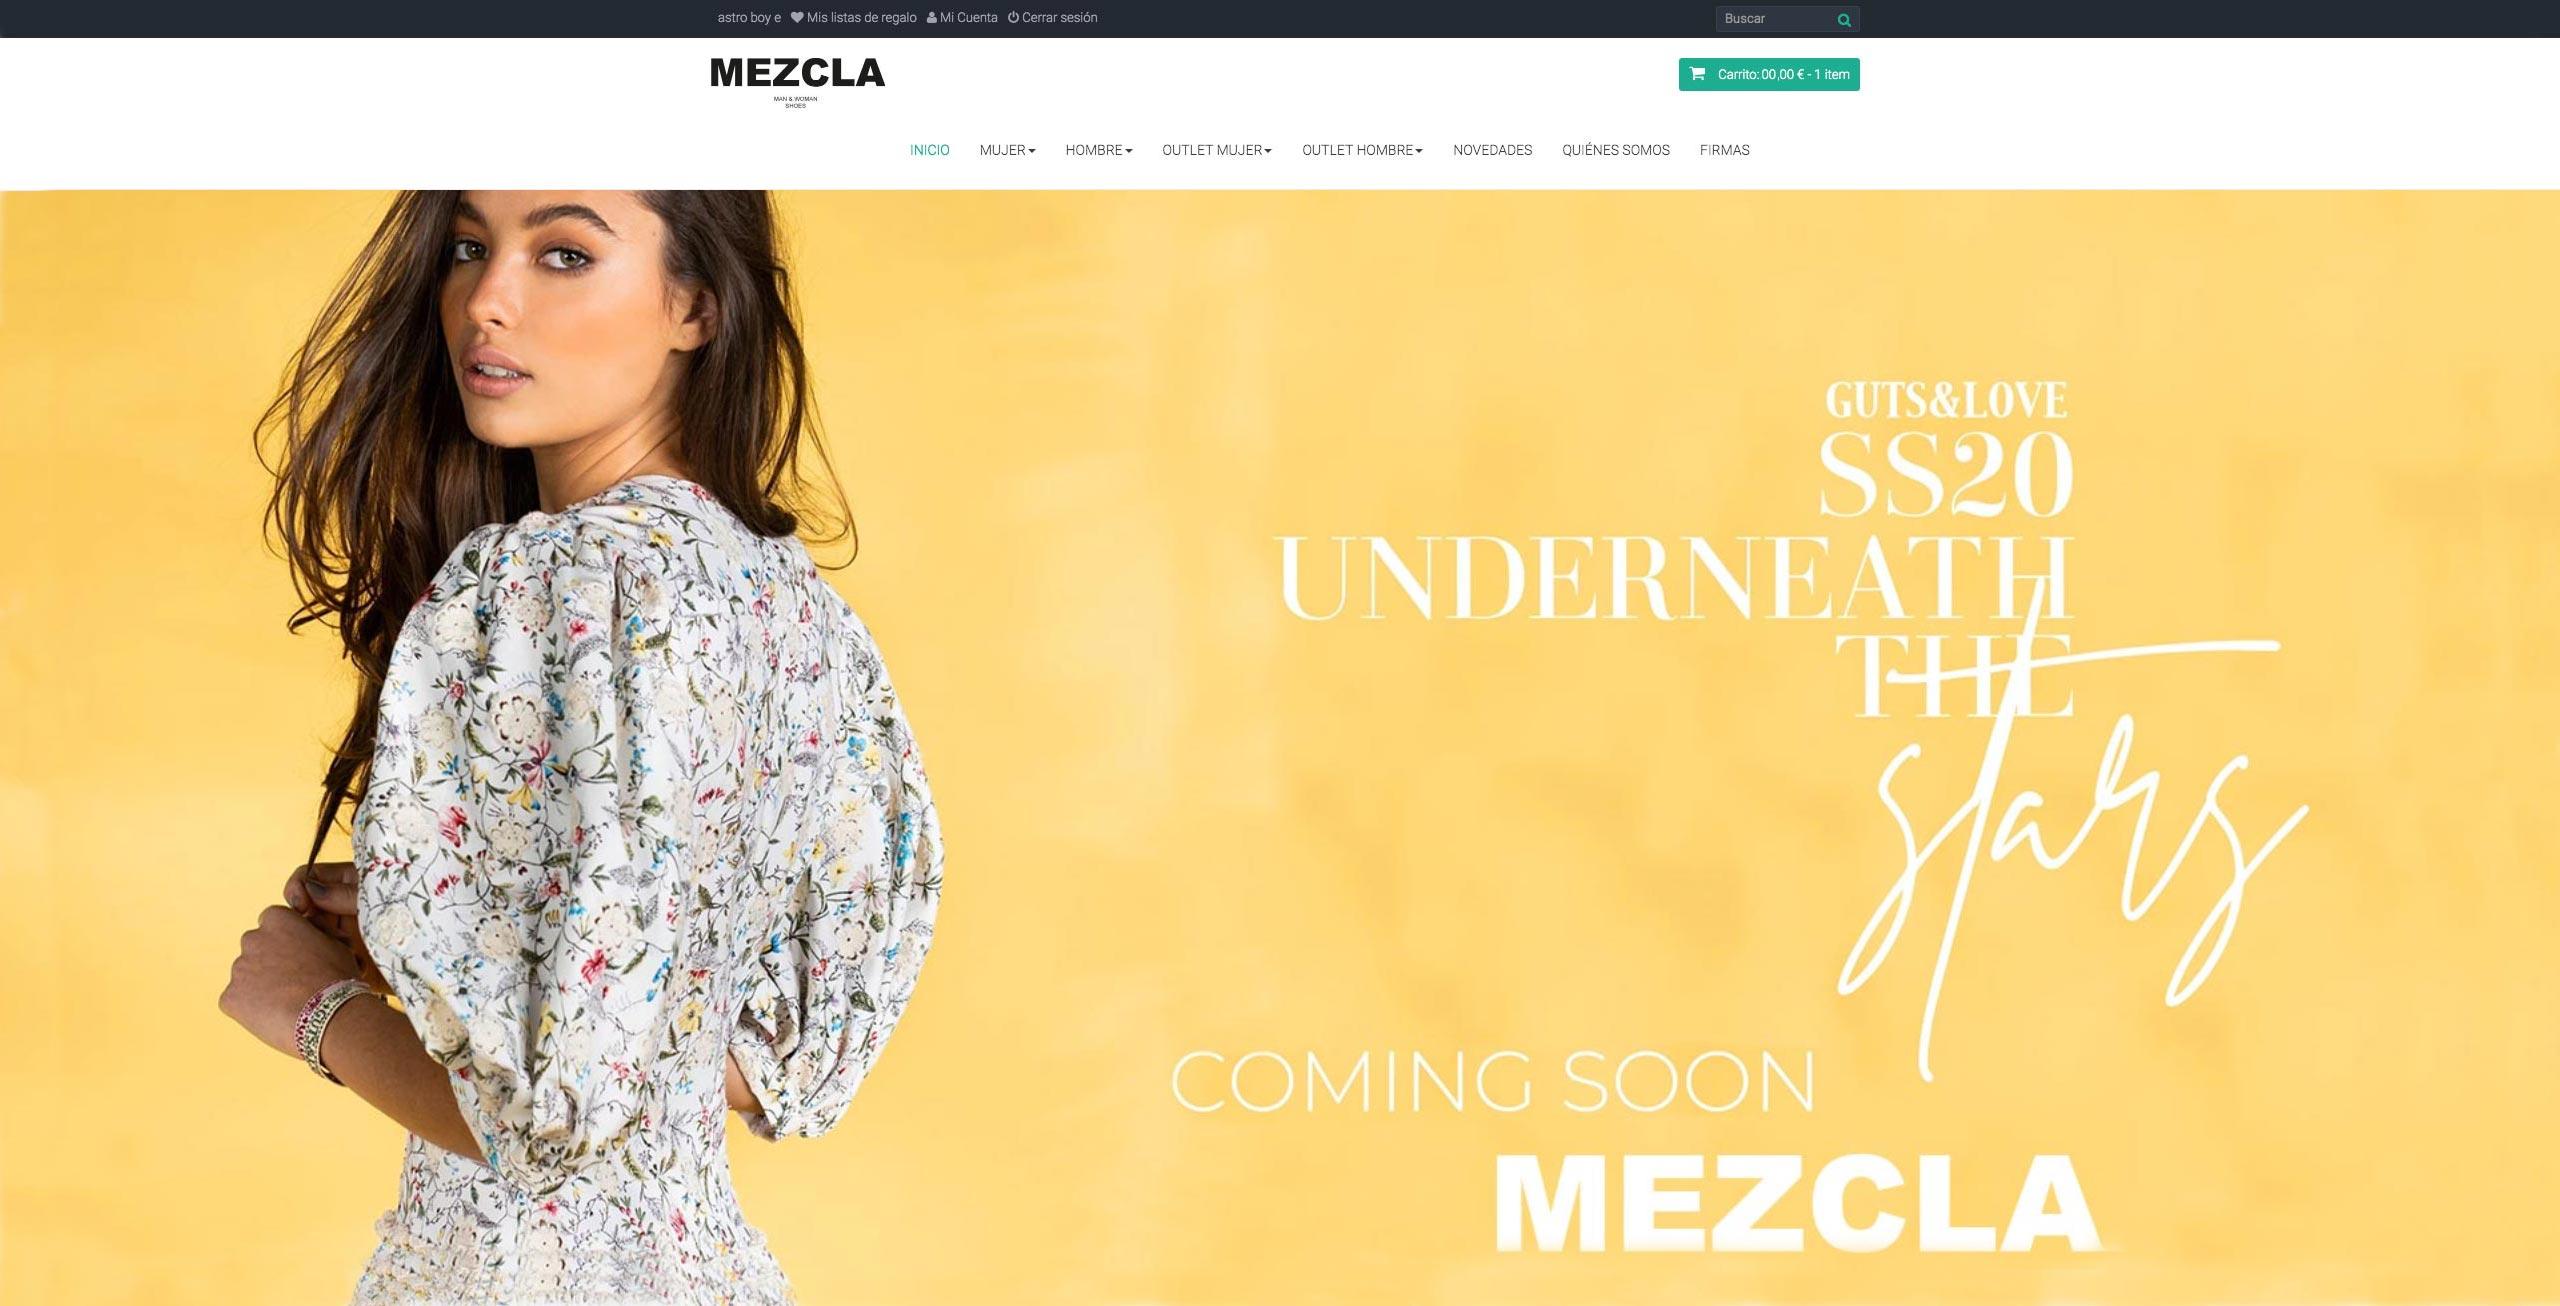 mezclalugo, tienda on-line en lugo